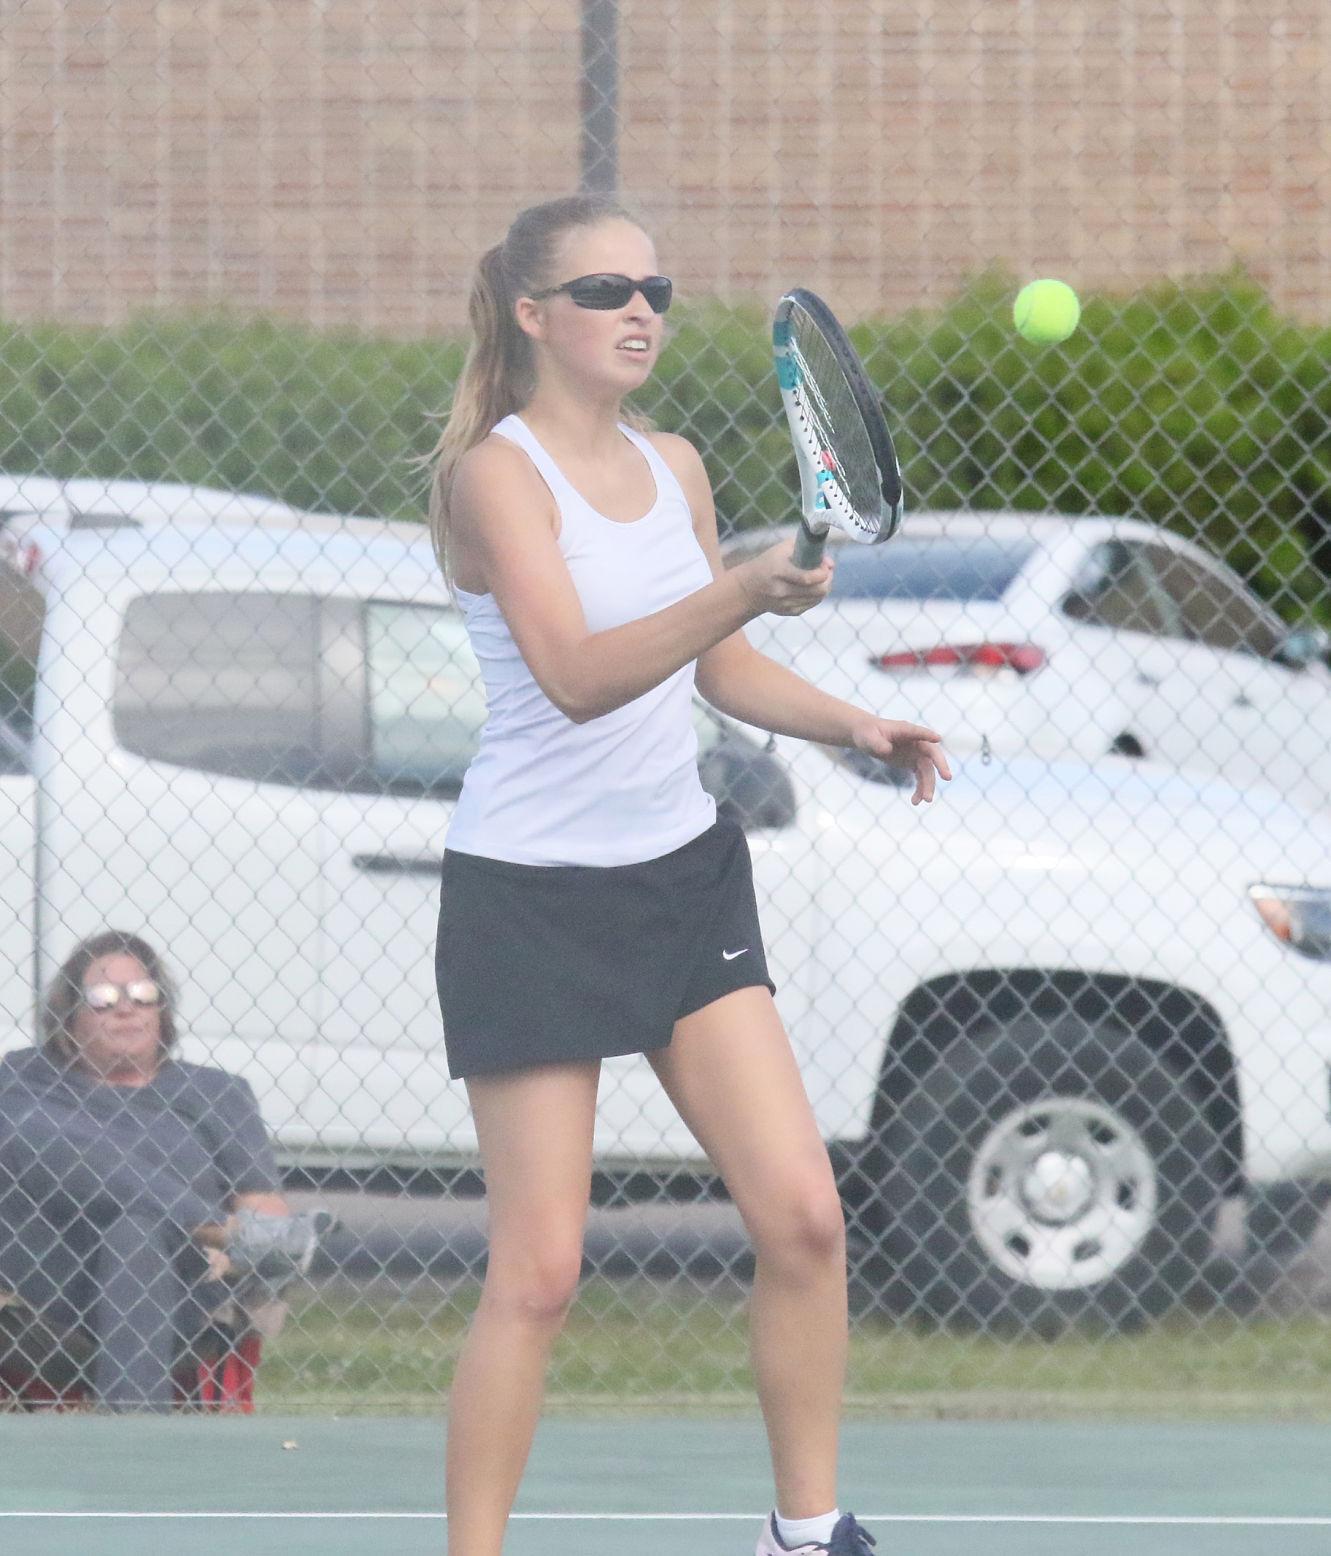 mcj-2021-04-28-sports-amory-tennis2